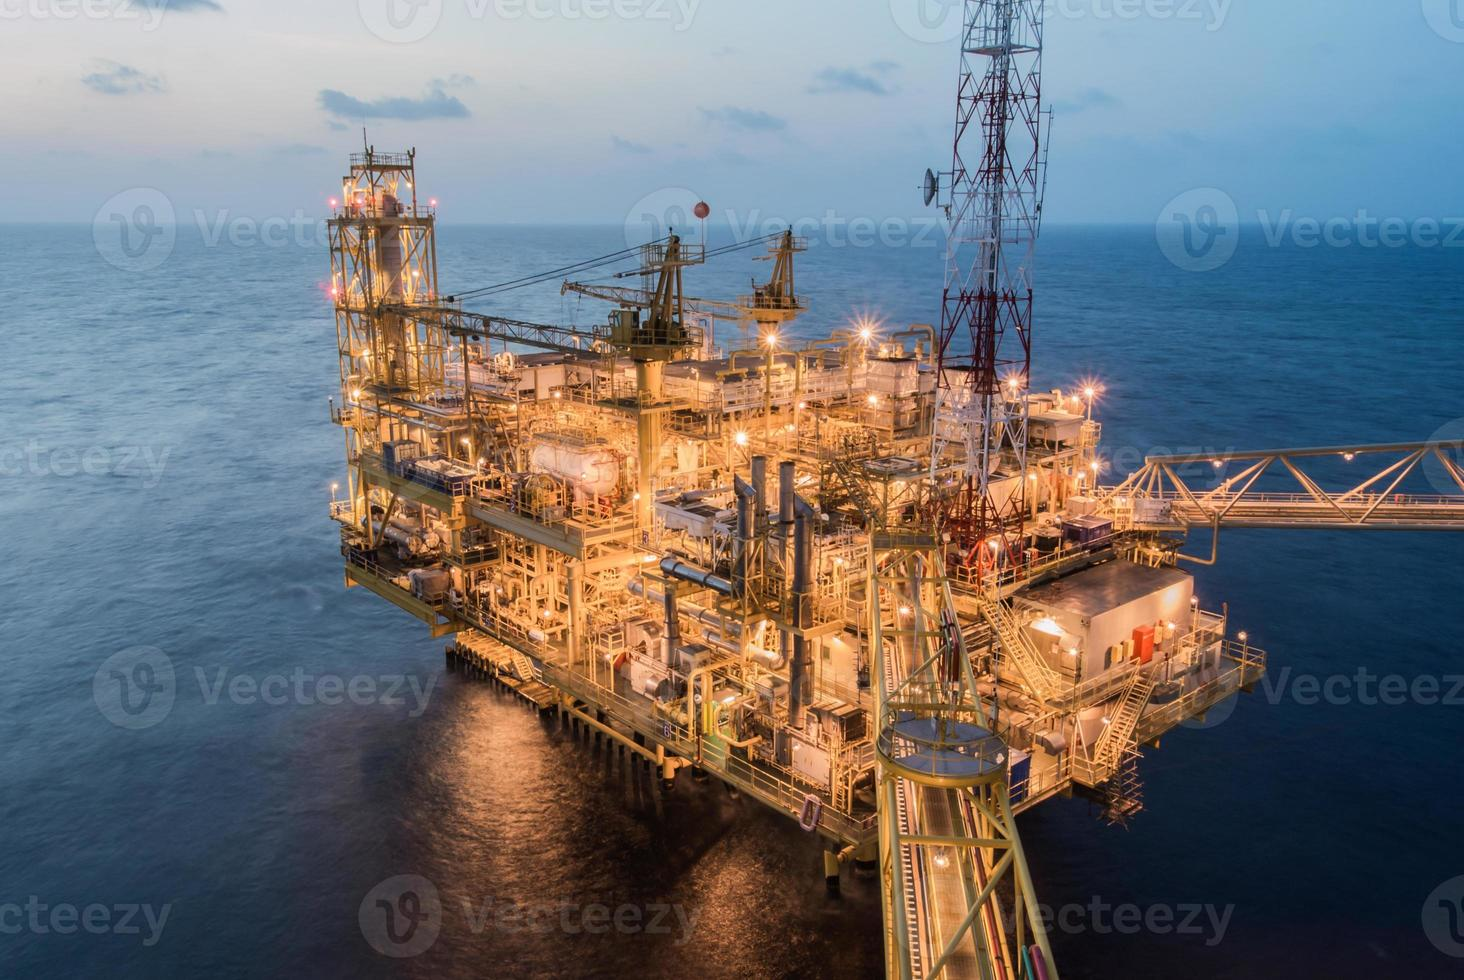 oil production platform on the sea photo